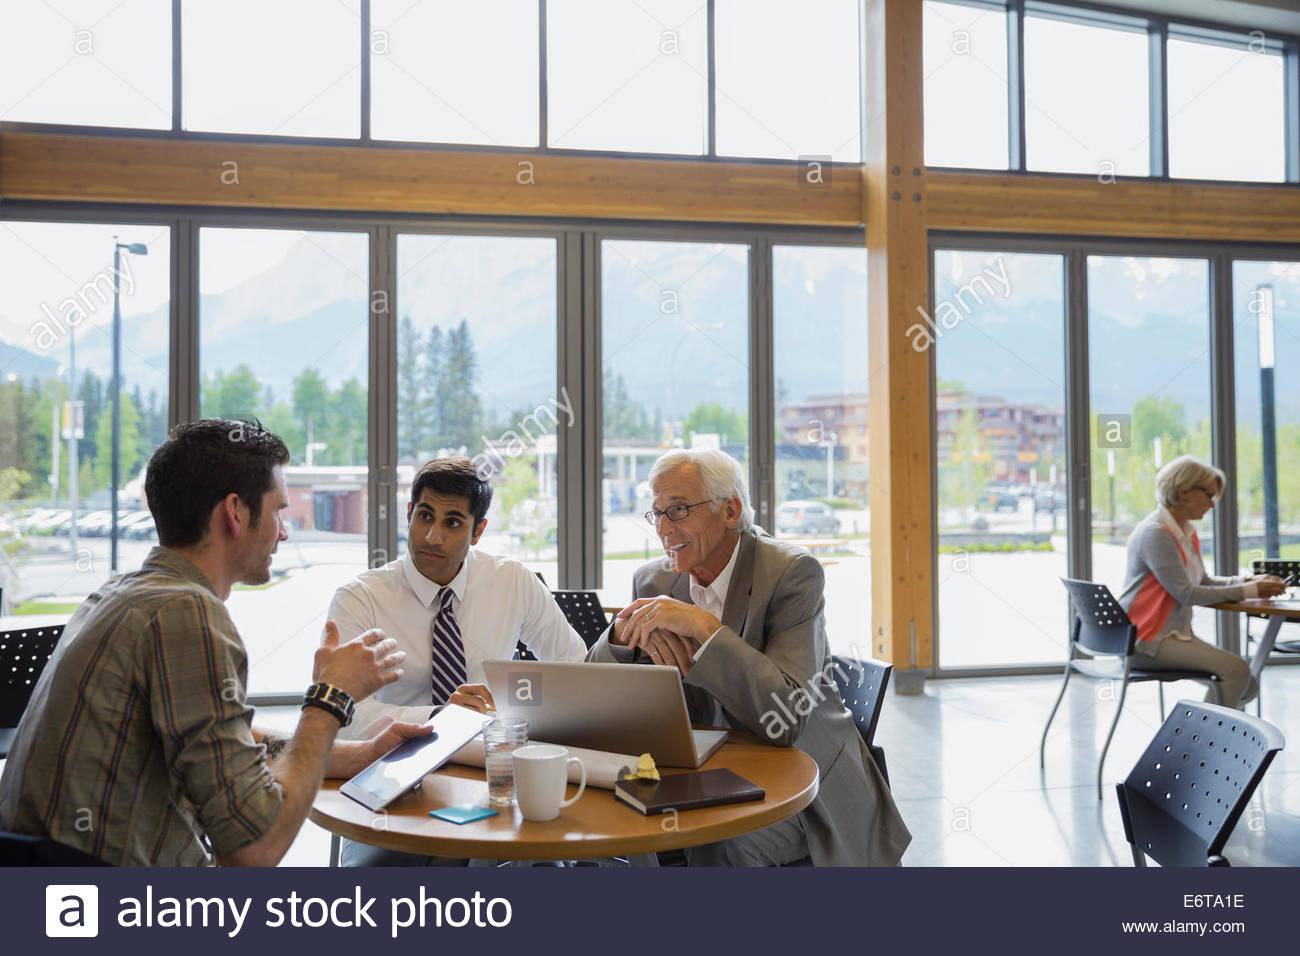 Businessmen talking in meeting - Stock Image